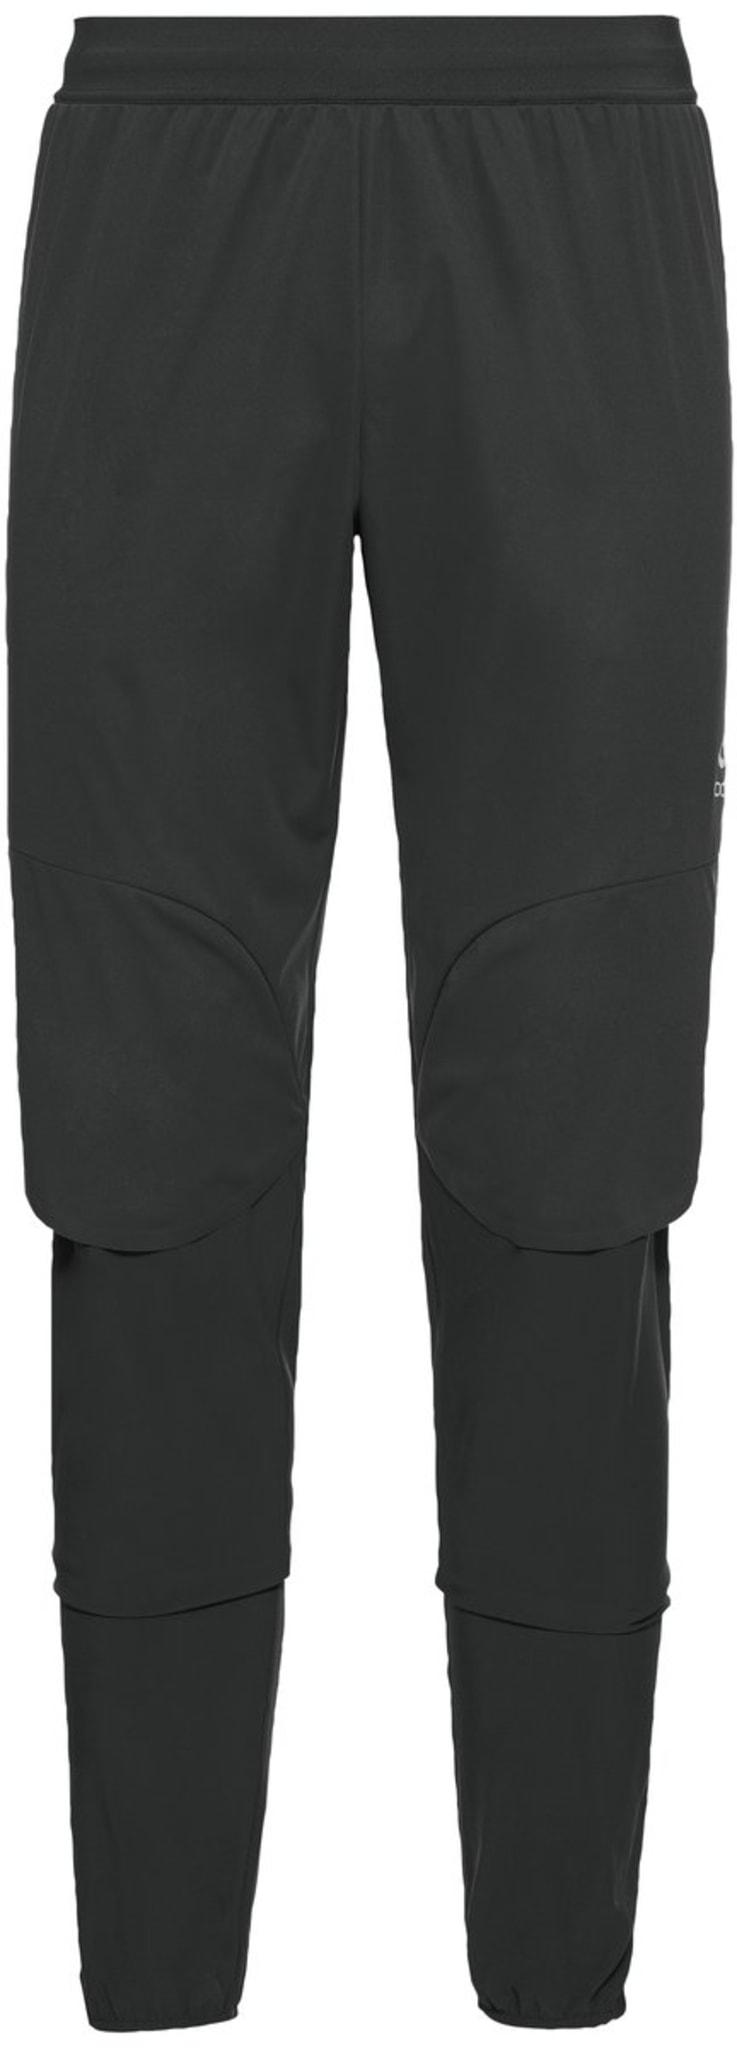 Zeroweight Warm Pants